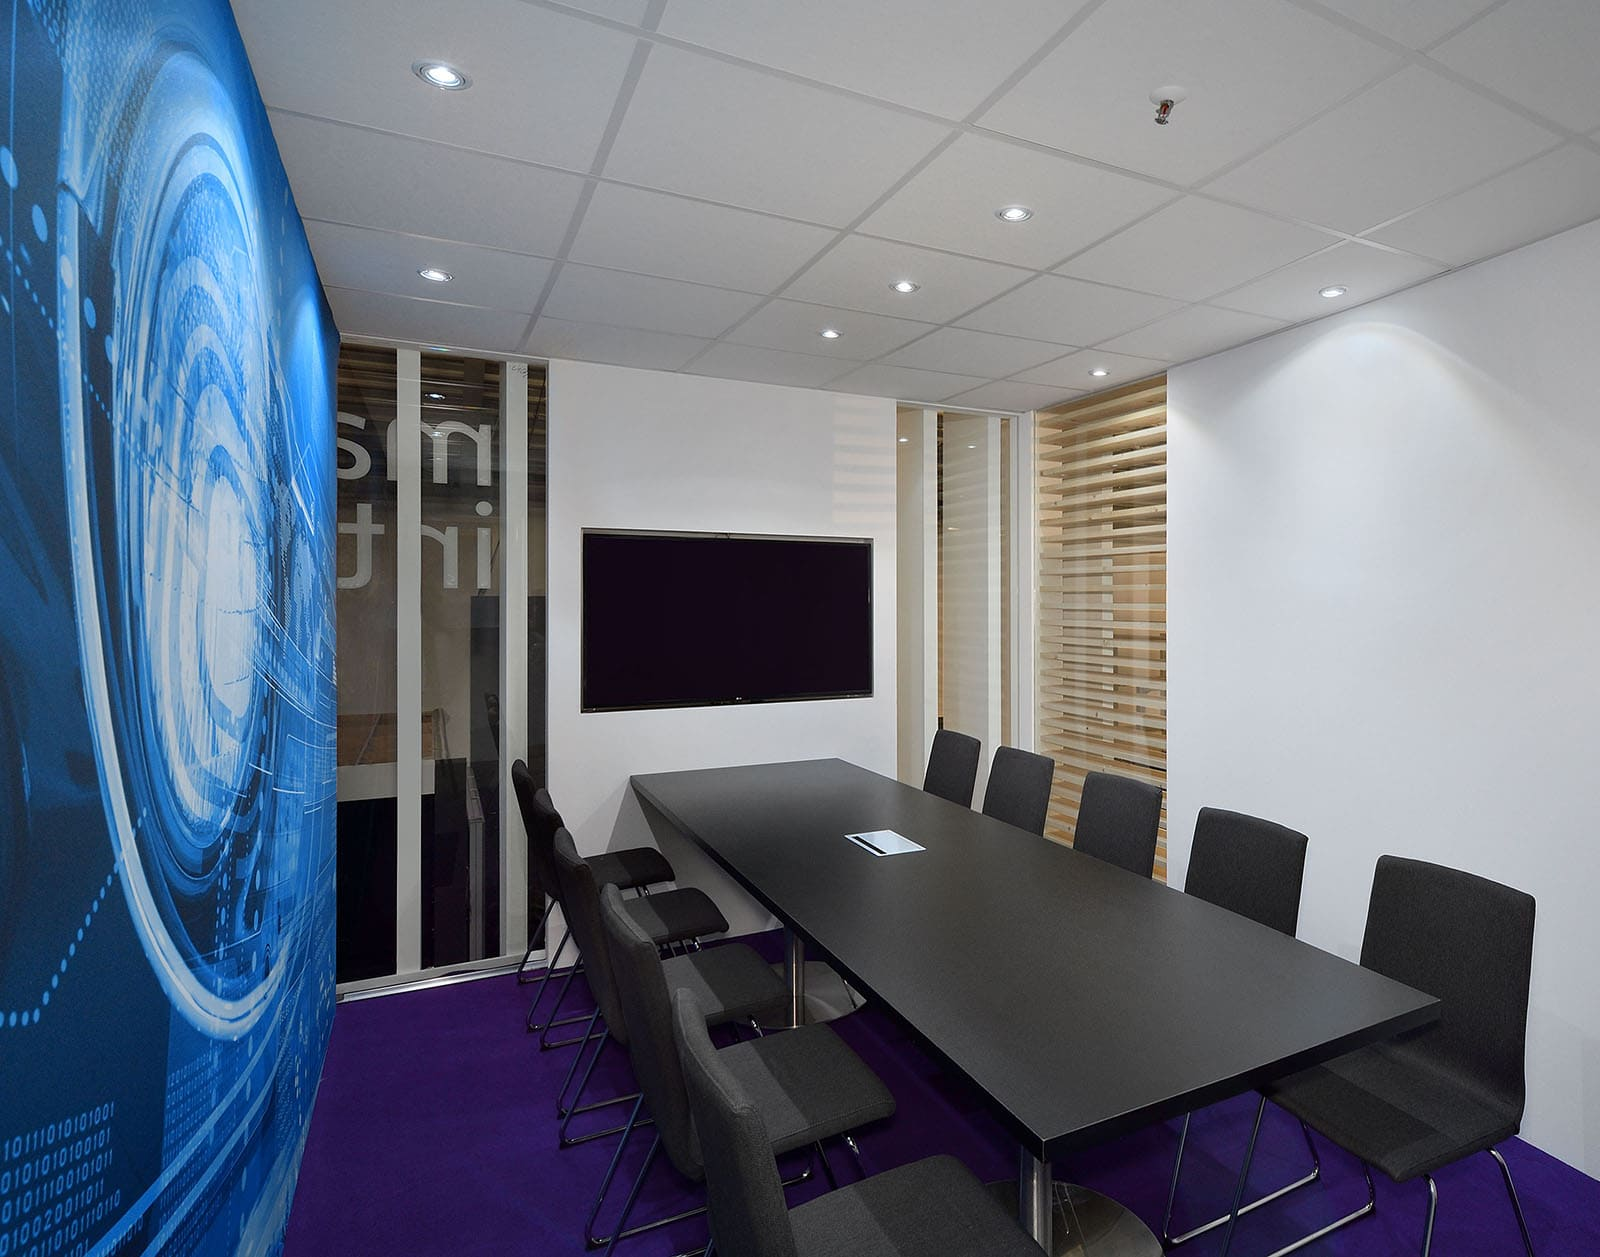 Maxim Exhibit Stand Interior Room by Nebula Exhibits